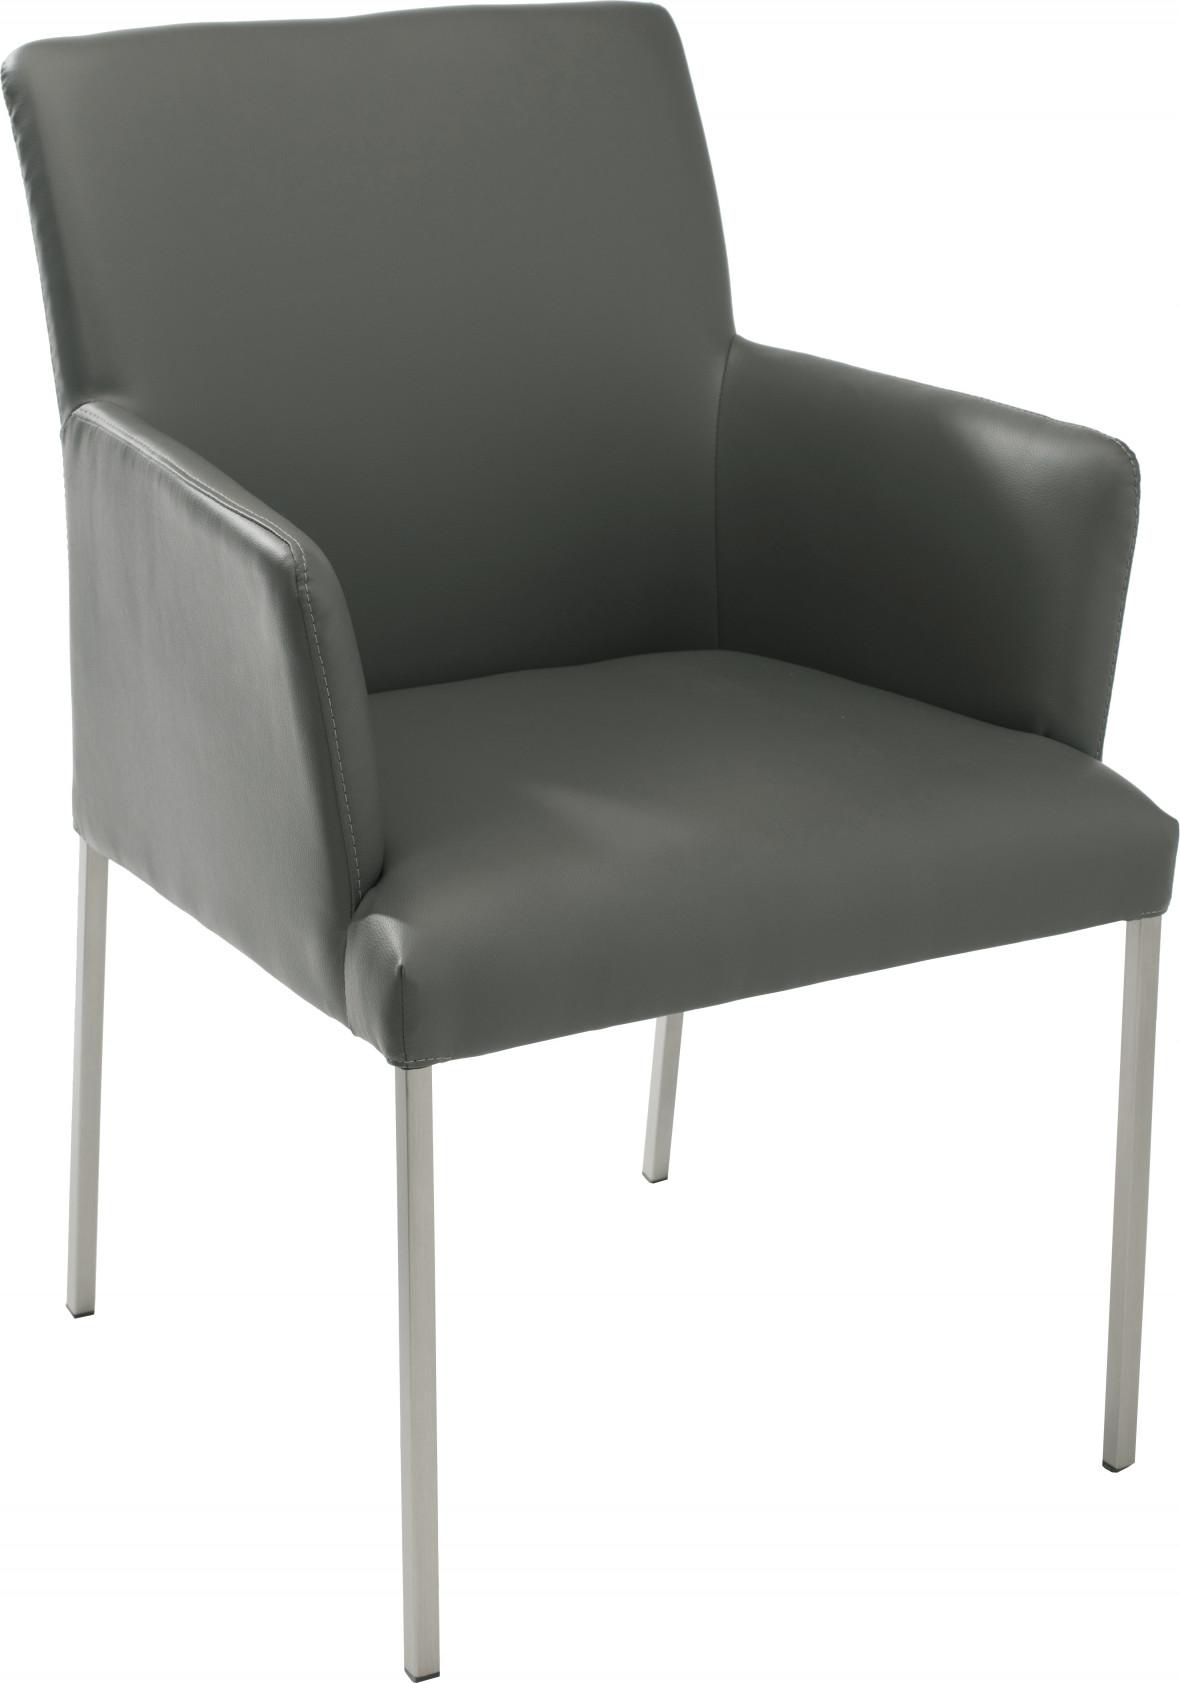 fauteuil anthracite pu gris fauteuil pu gris fauteuil anthracite pu UzMVqSp